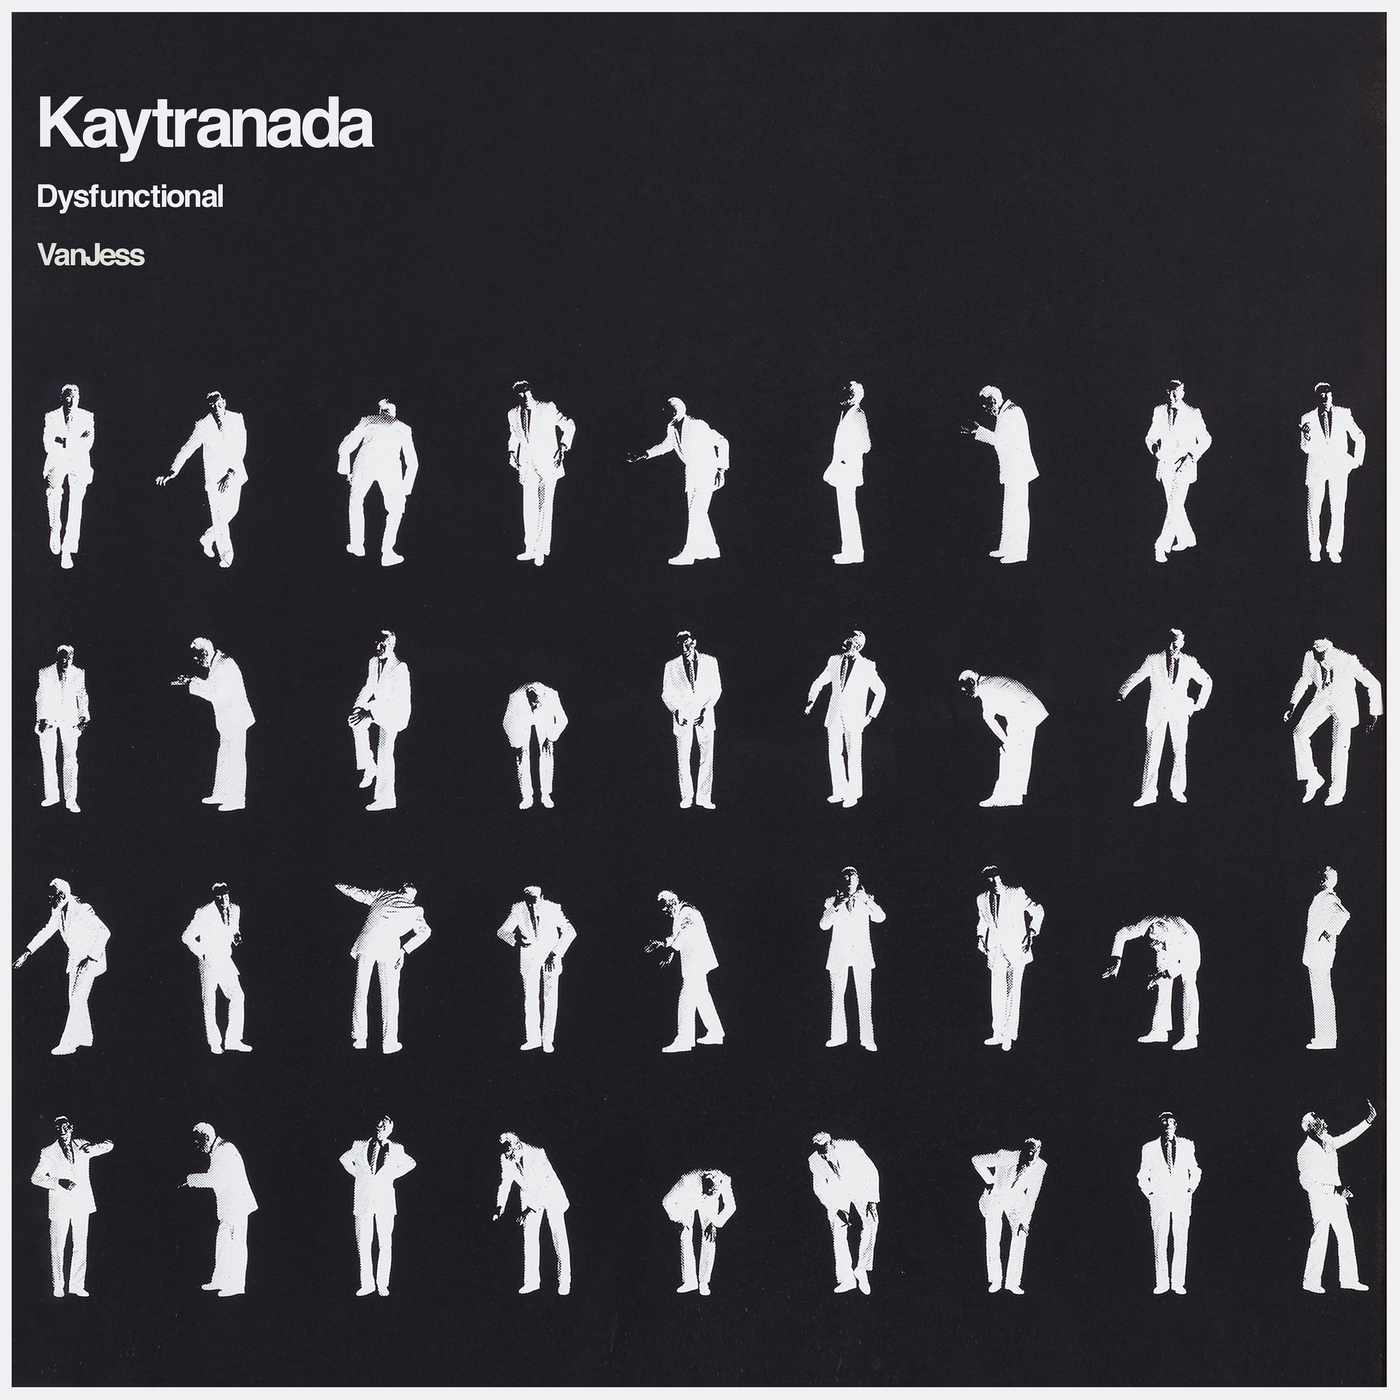 DYSFUNCTIONAL - KAYTRANADA